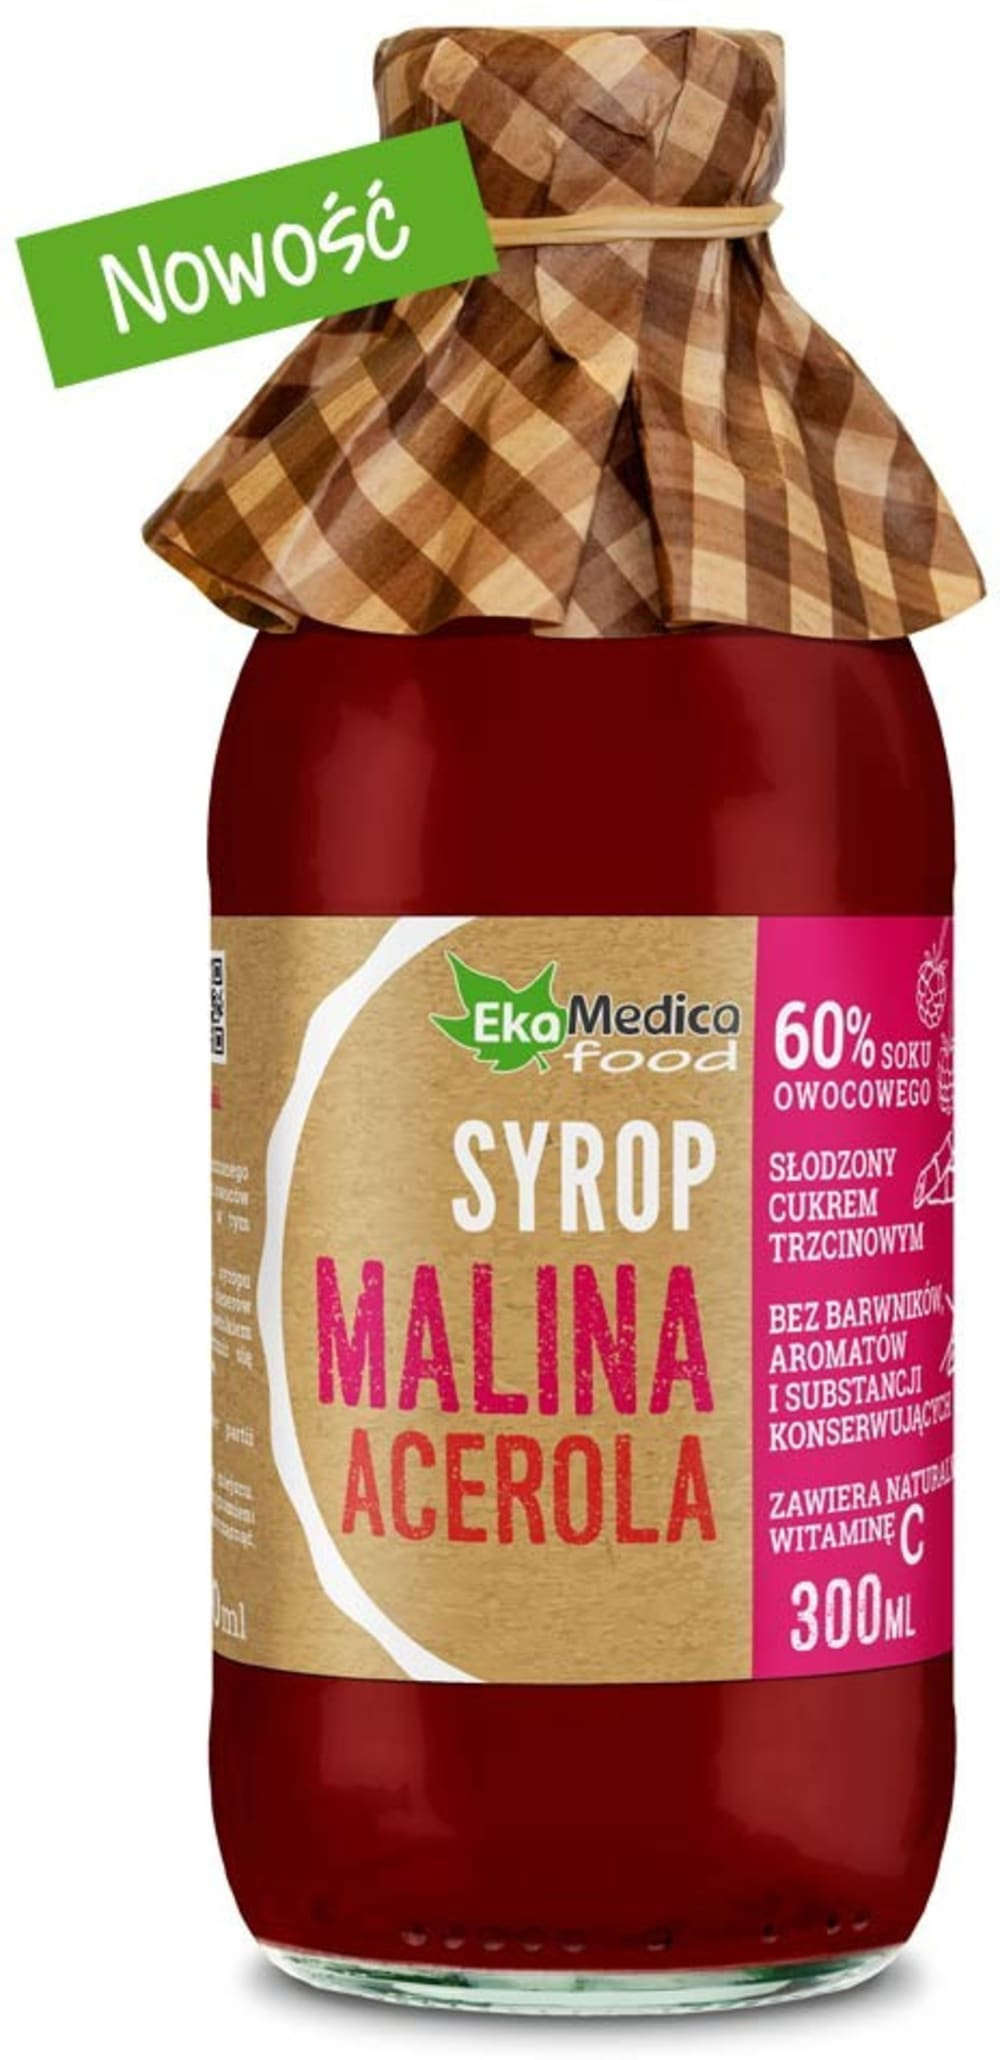 Syrop Malina Acerola 300ml